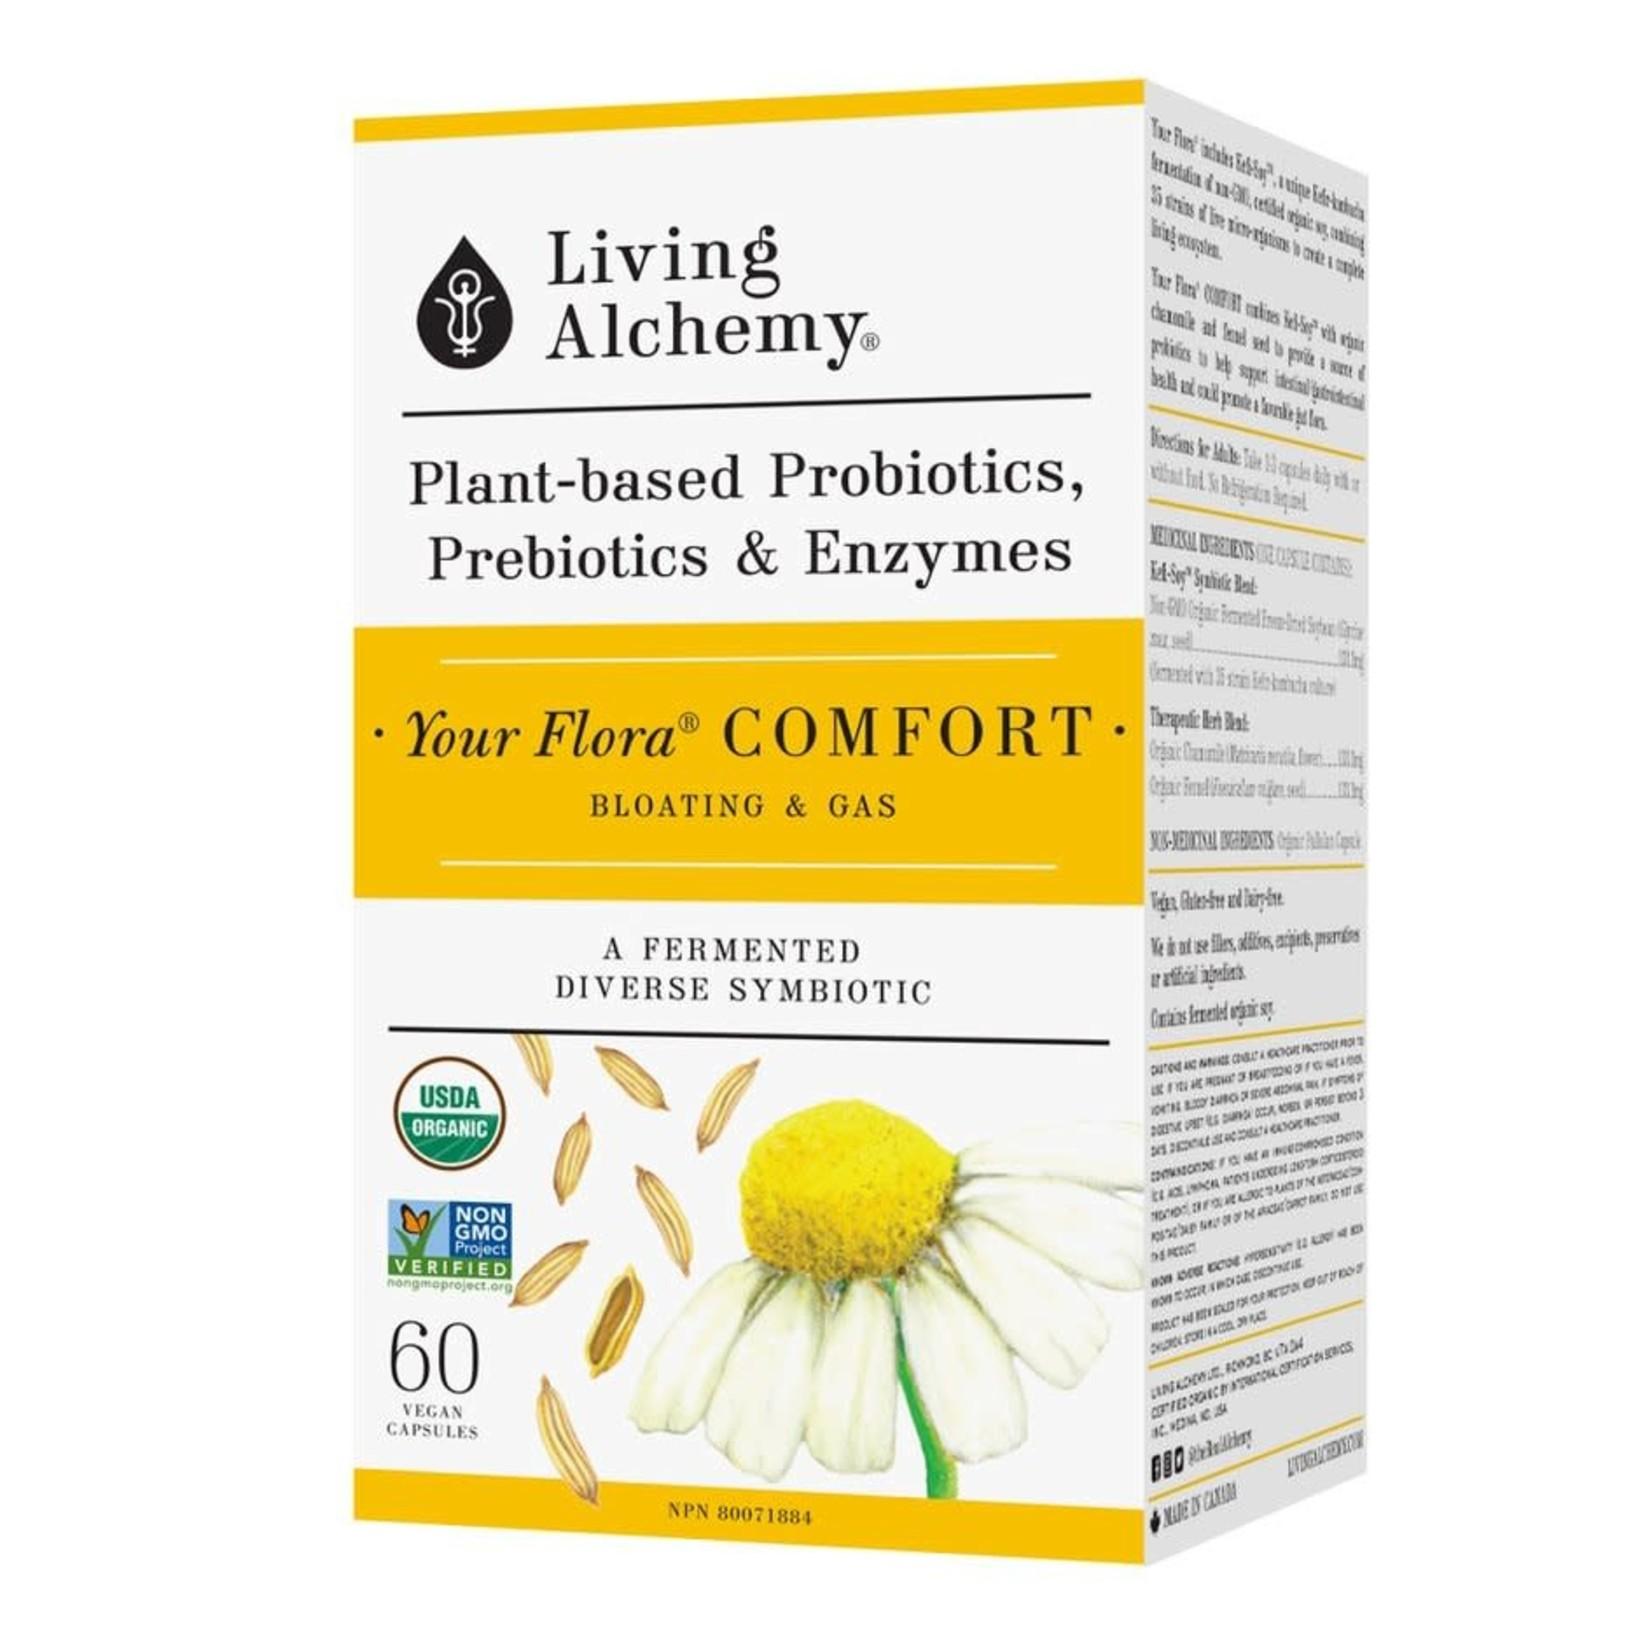 Living Alchemy Living Alchemy Your Flora - Comfort